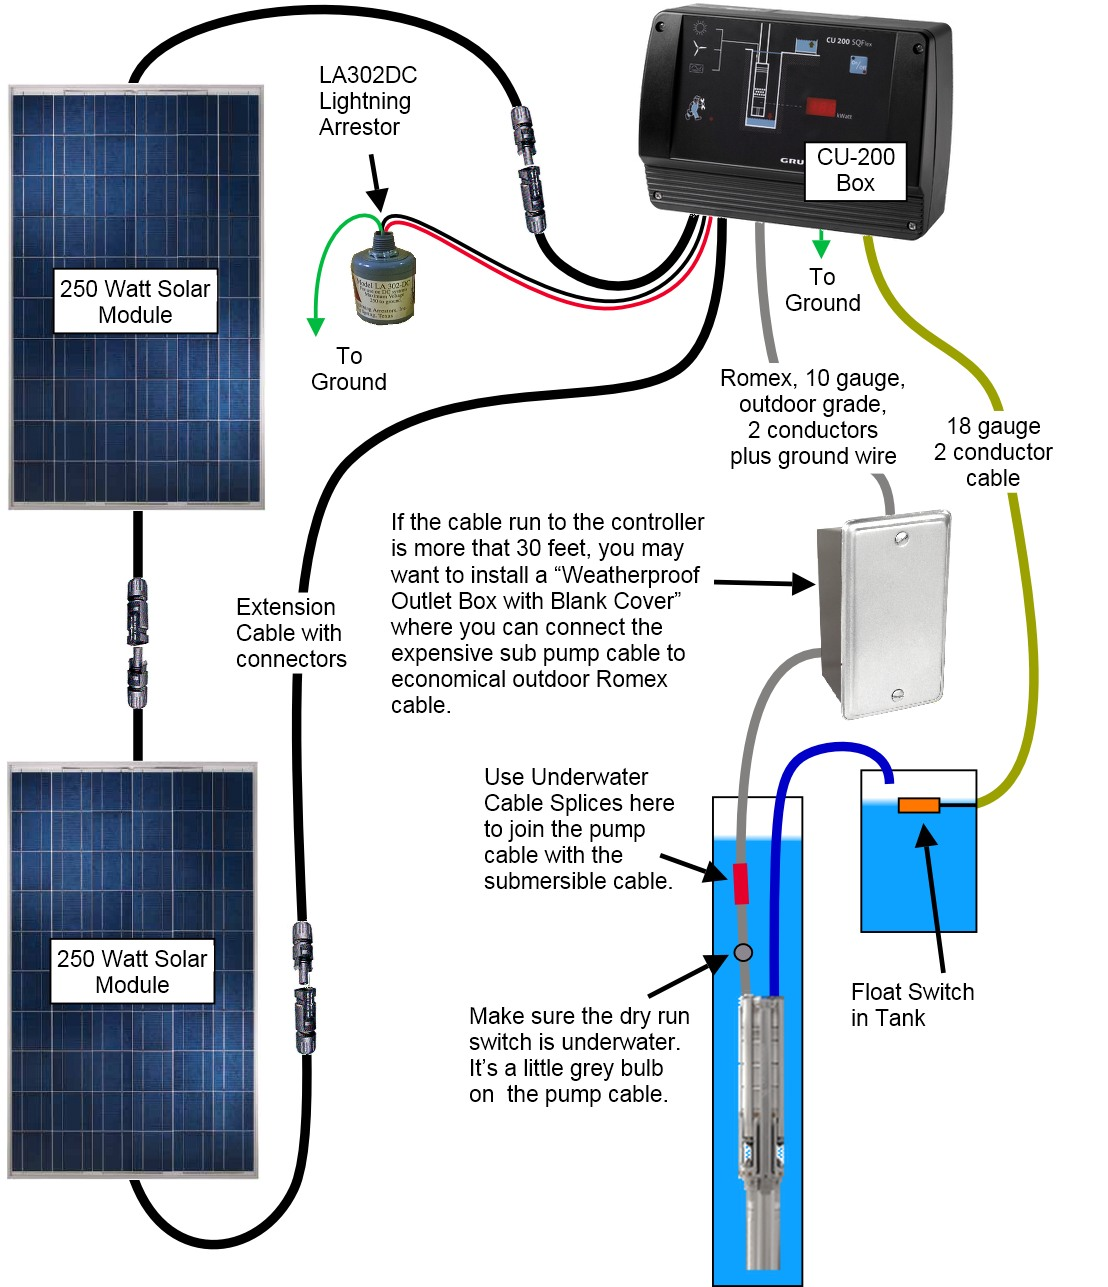 grundfos solar panel wiring diagram enthusiast wiring diagrams u2022 rh rasalibre co